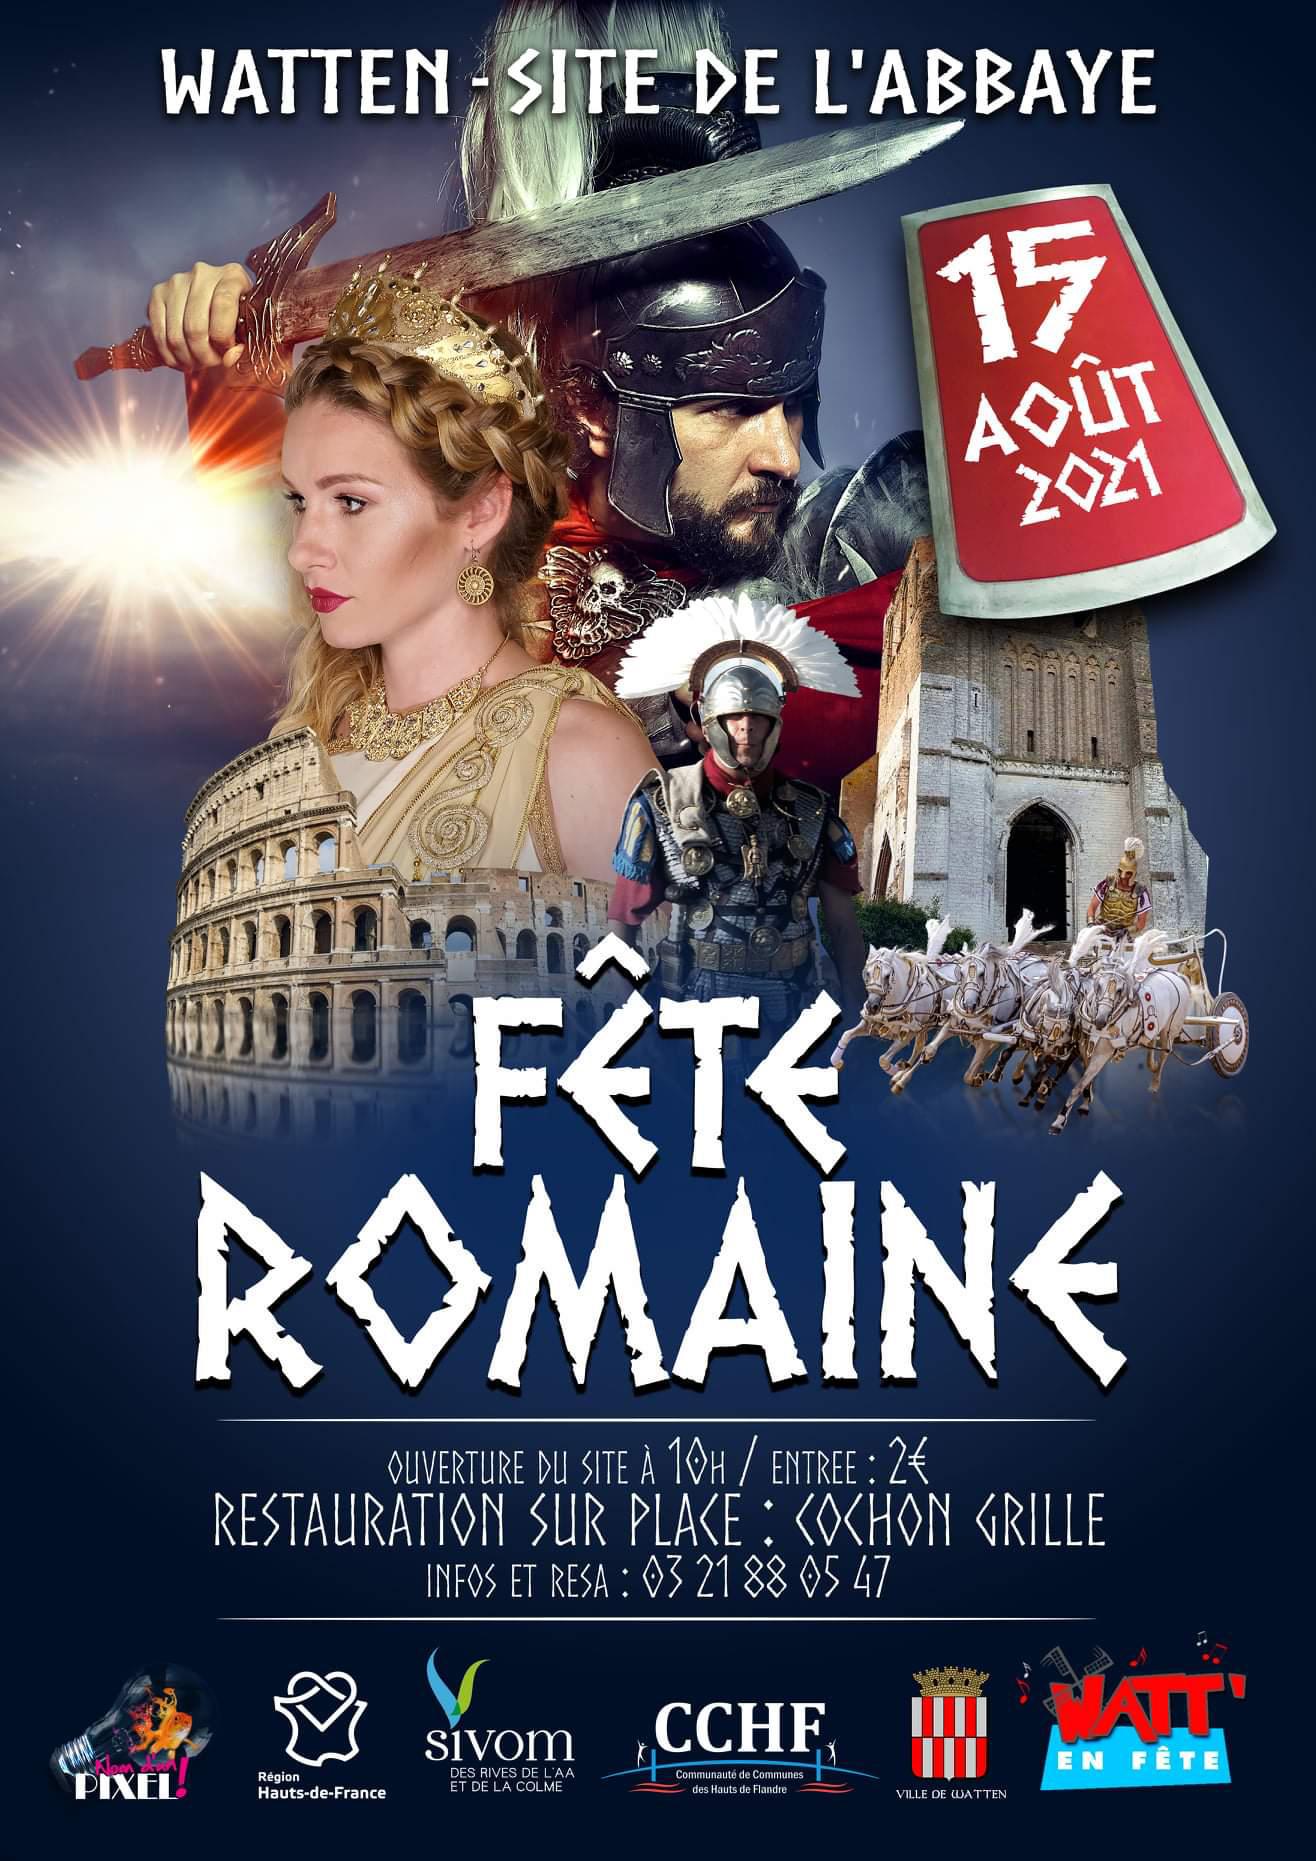 2021-08-15 fête romaine à l'abbaye de Watten.jpg